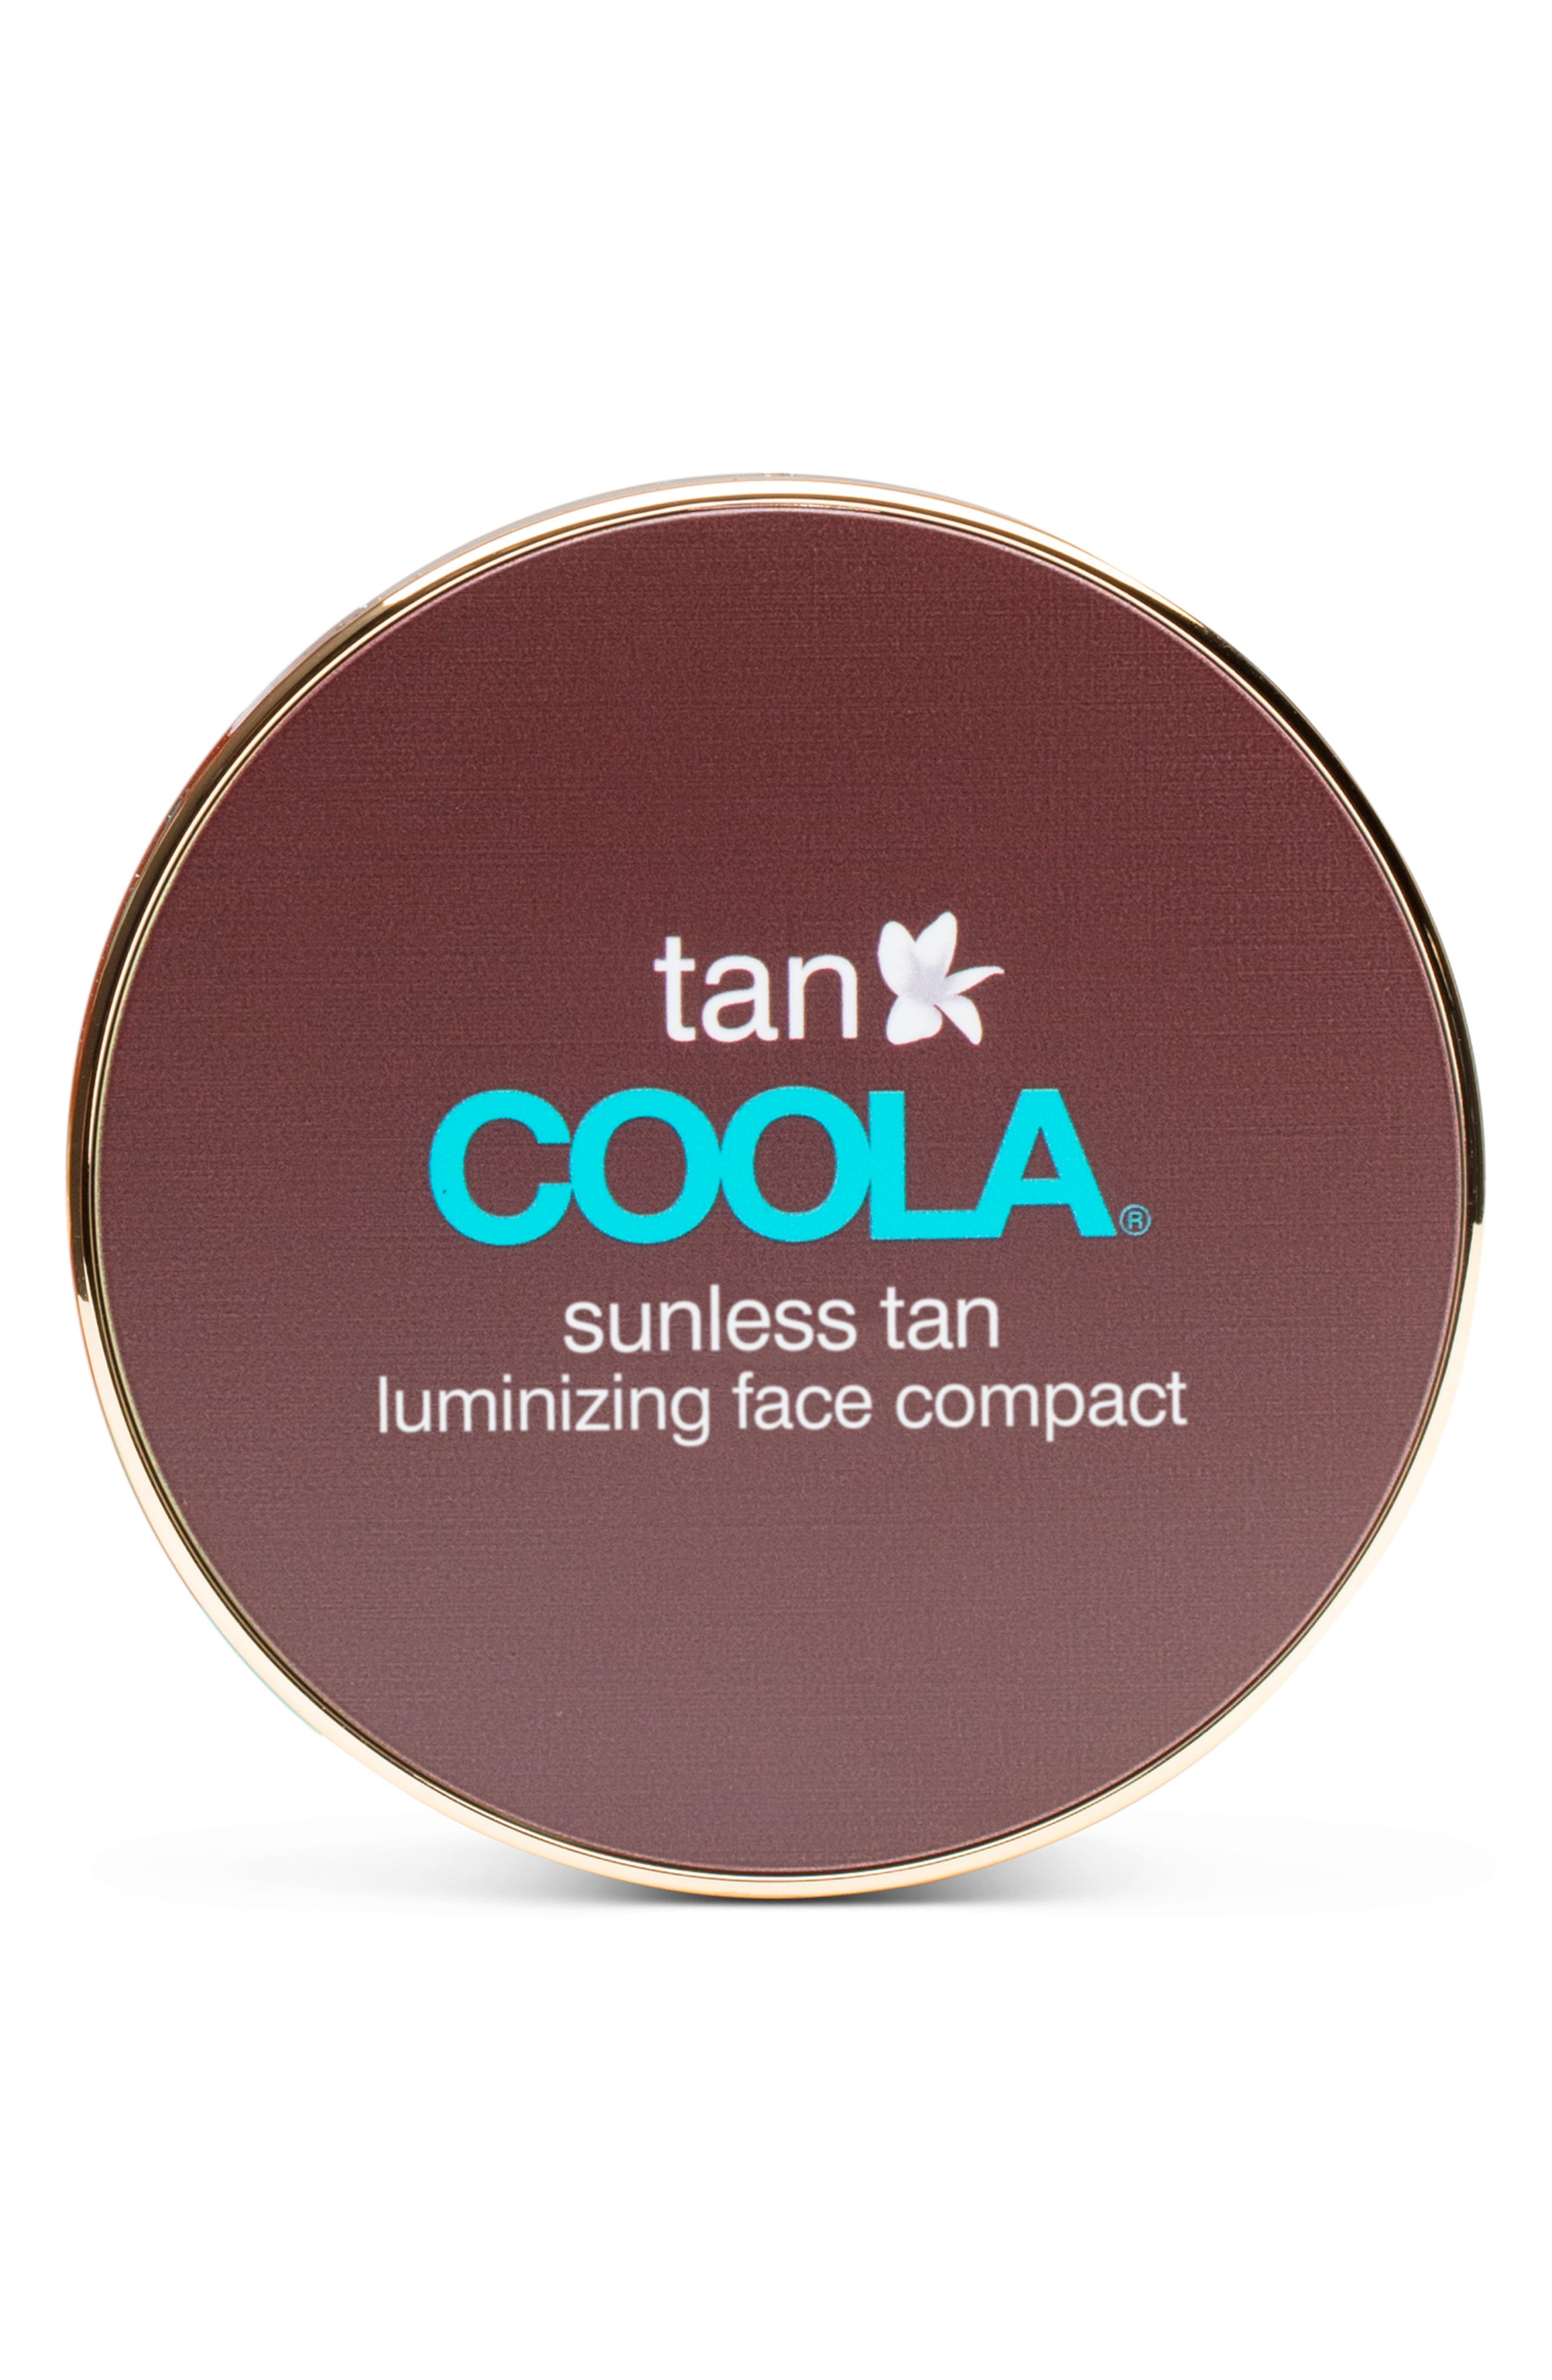 Coola Suncare Organic Sunless Tan Luminizing Face Compact